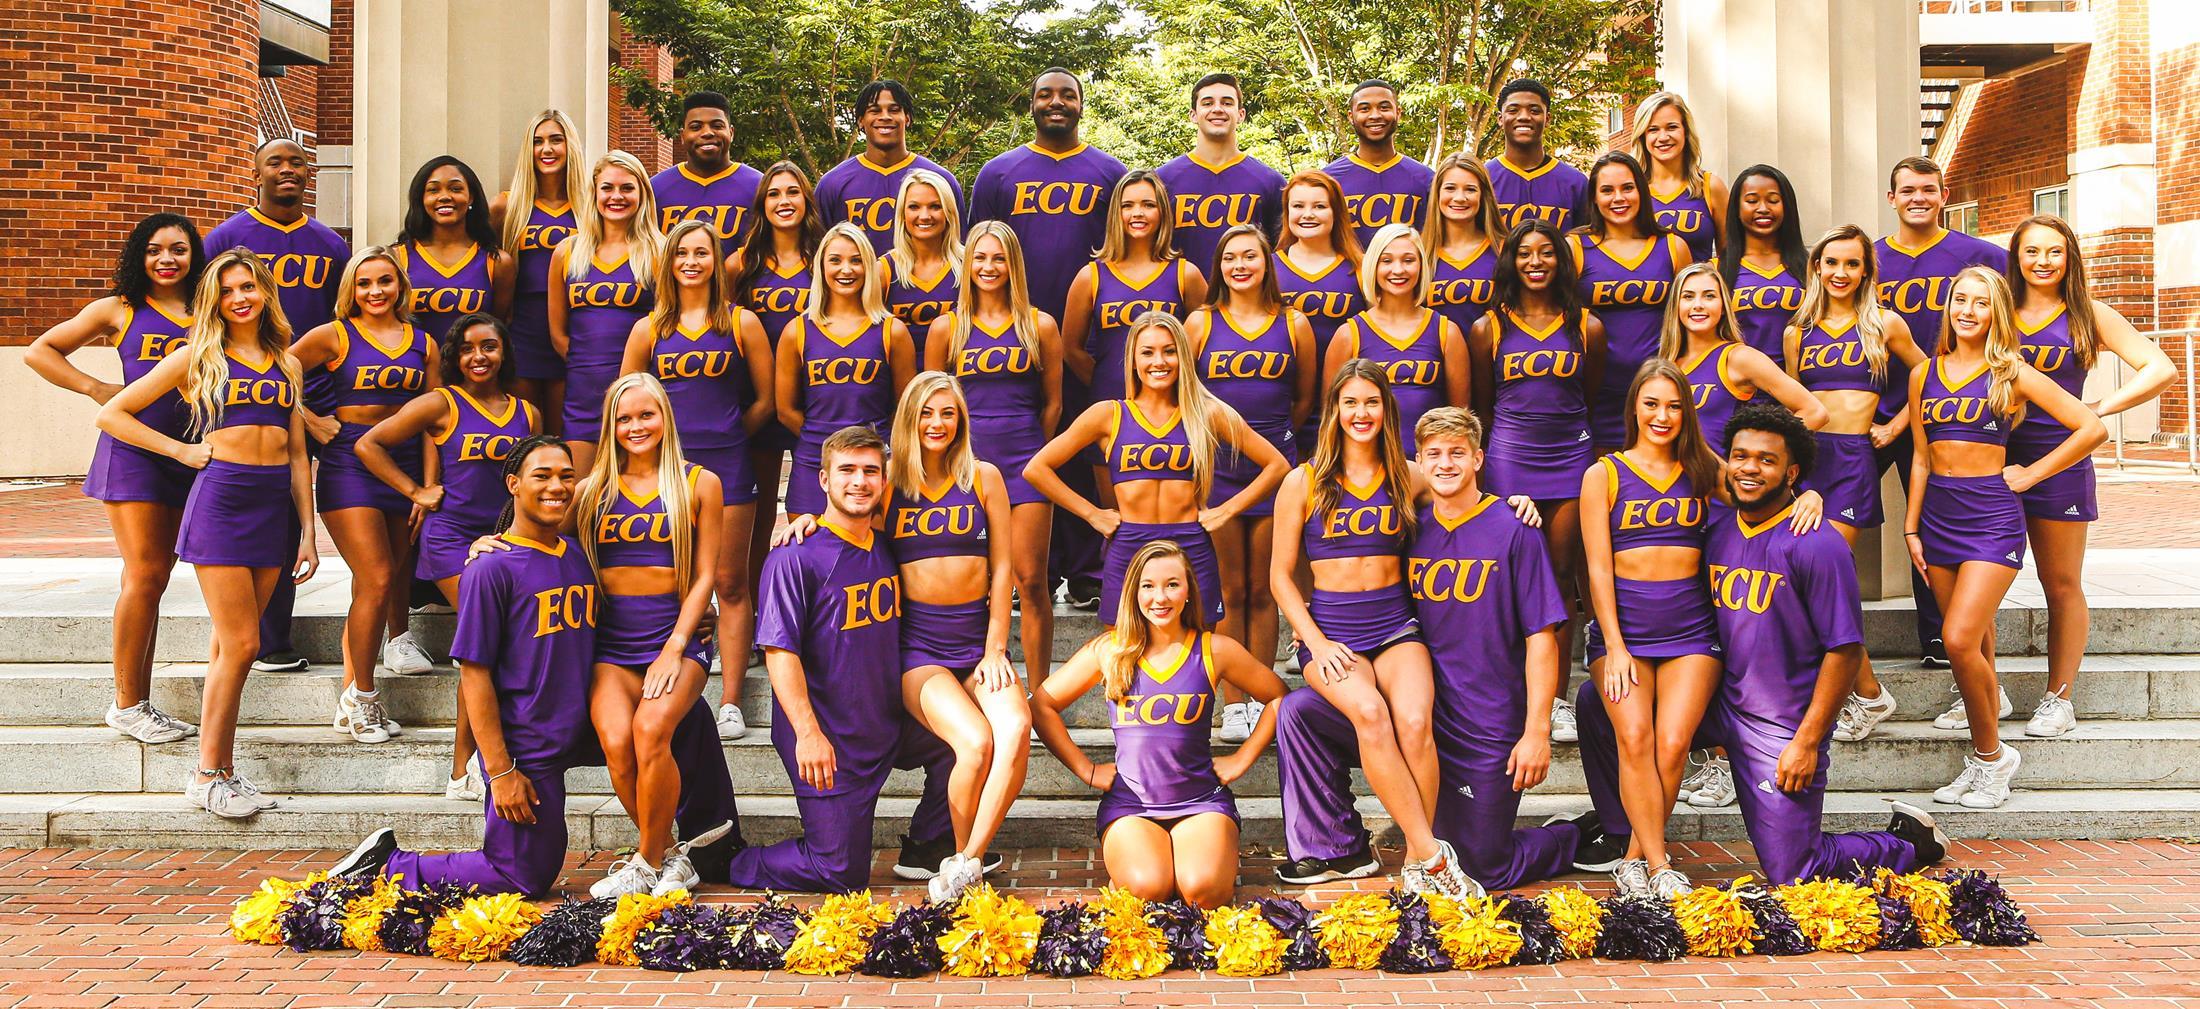 Cheerleading - East Carolina University Athletics throughout East Carolina University Academic Calendar